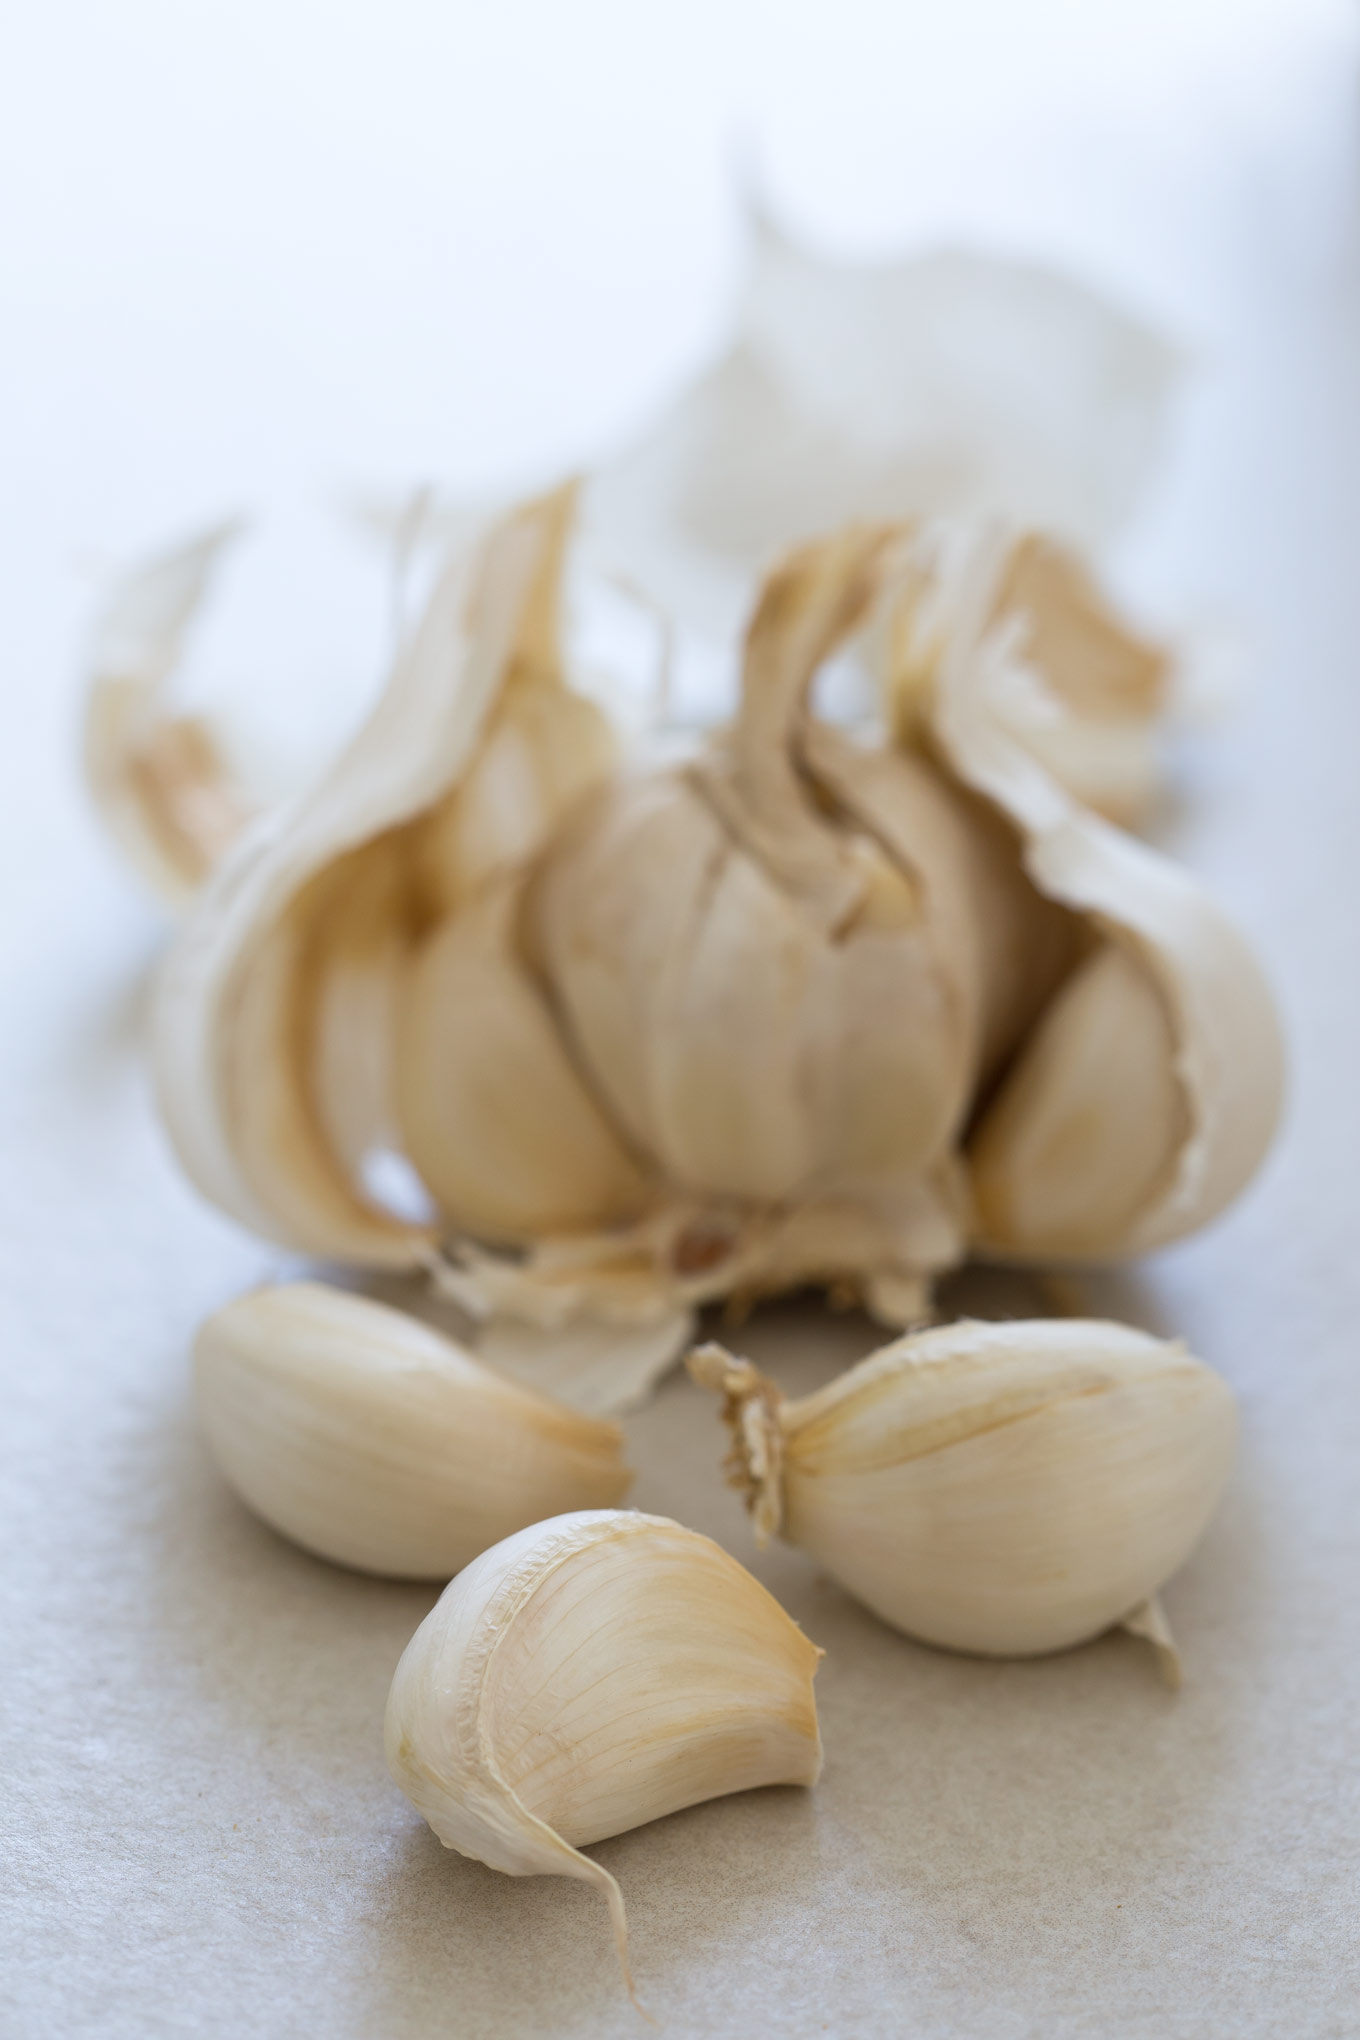 Garlic Cloves broken away from a whole head of garlic